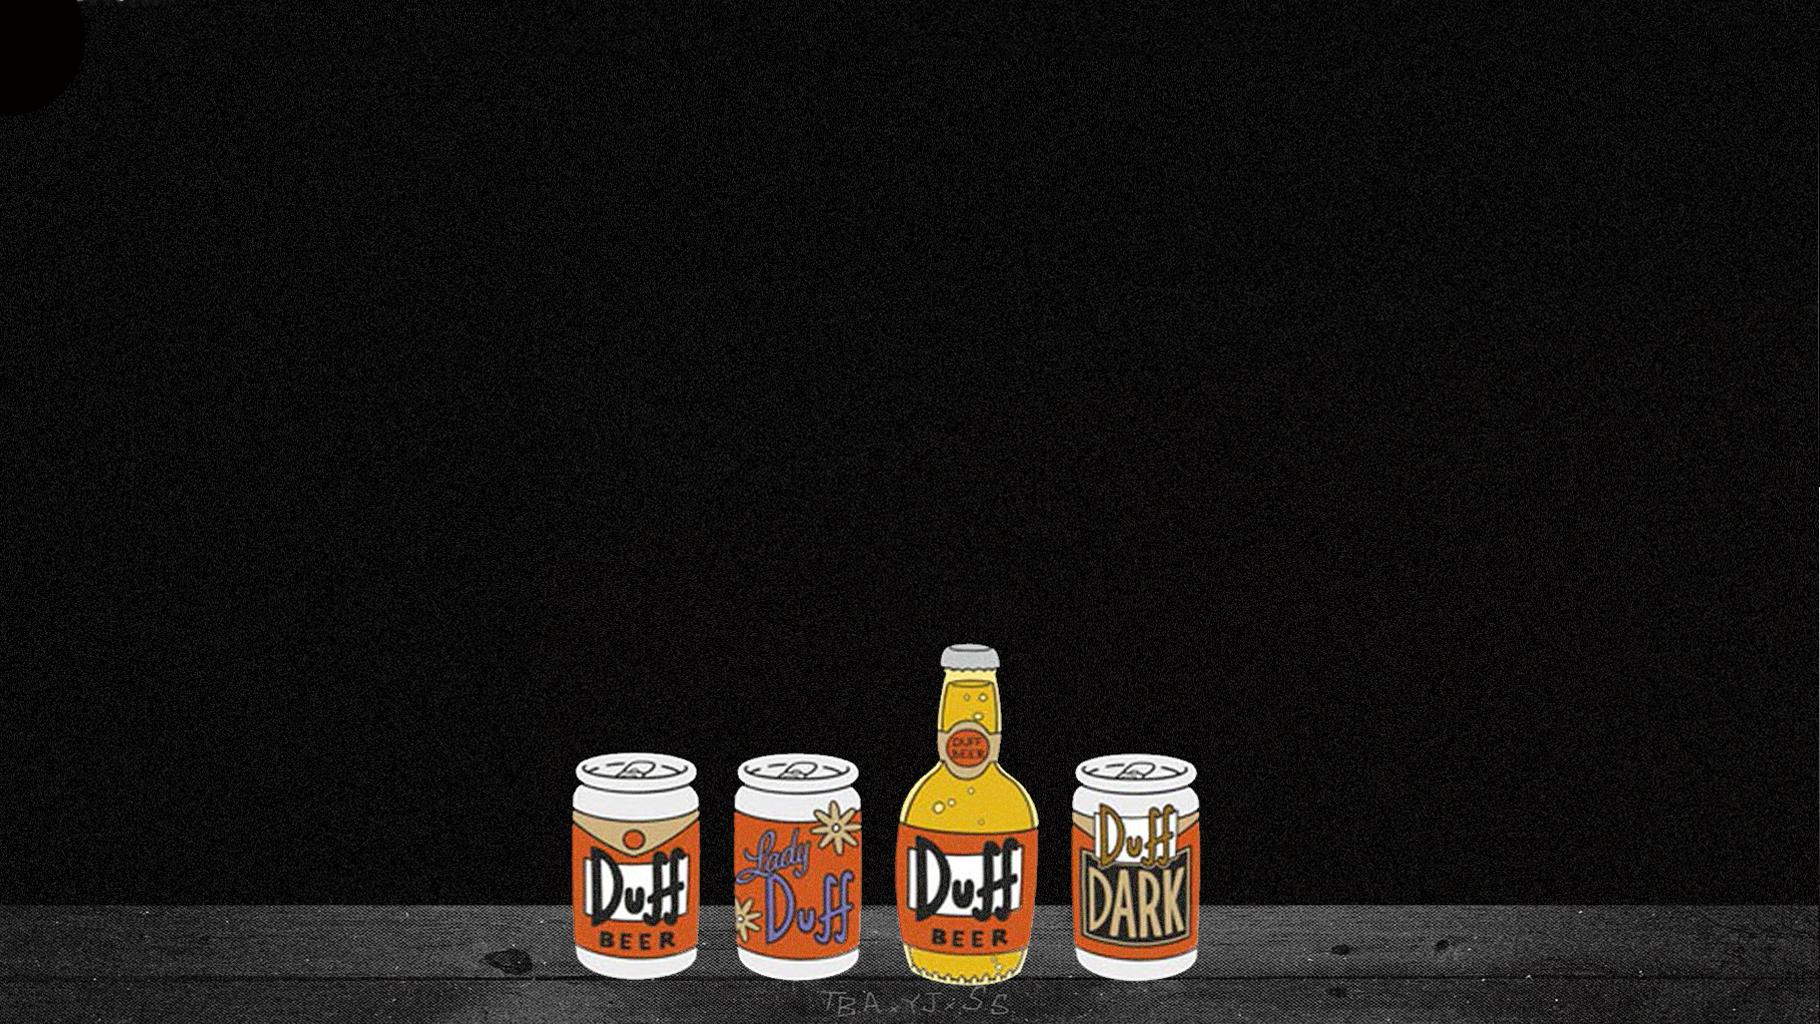 duff beer alcohol simpsons black wallpaper 1820x1024